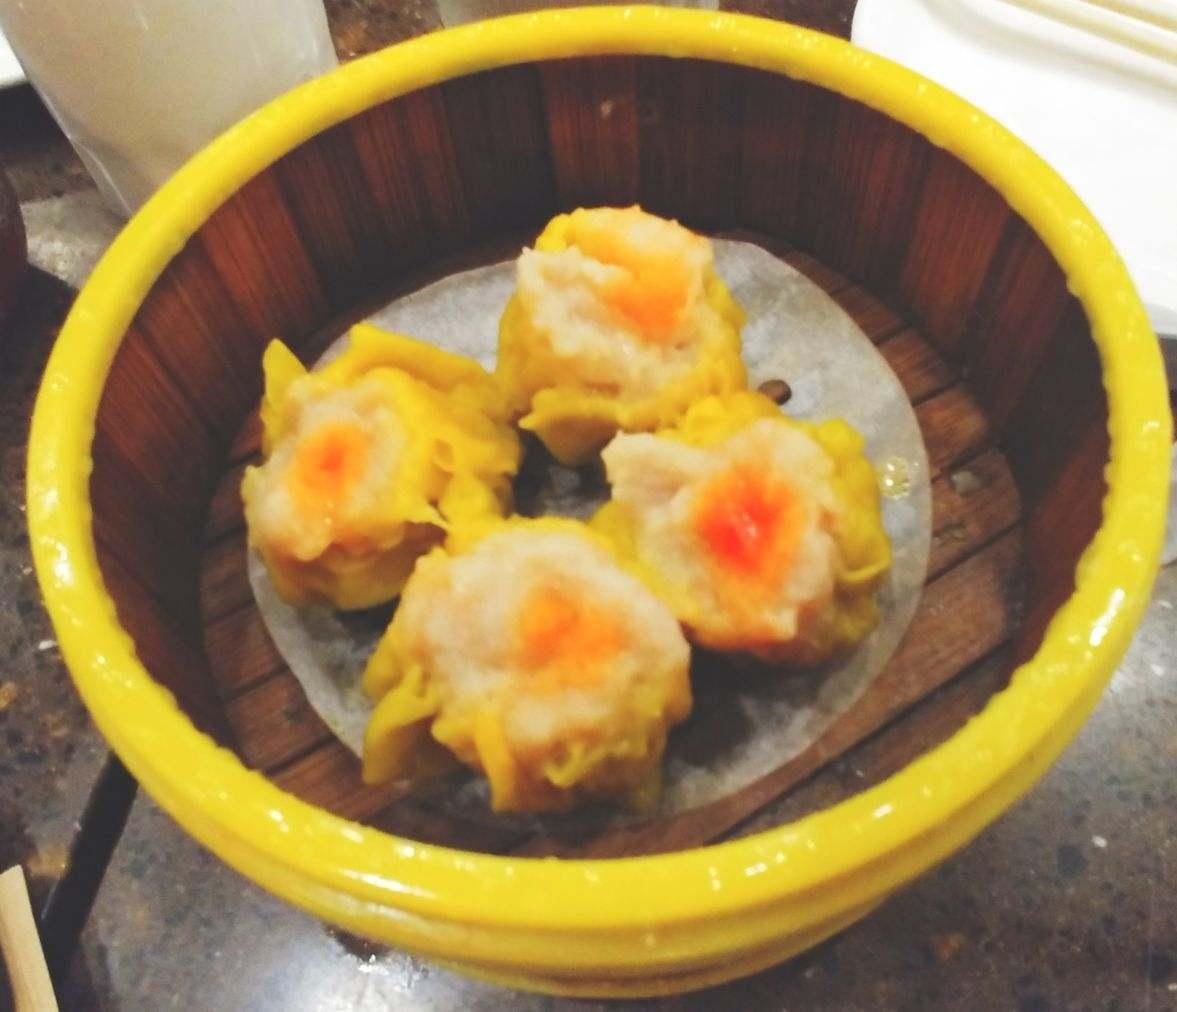 King Chef Dimsum Kitchen's Bird's Eye Dumpling